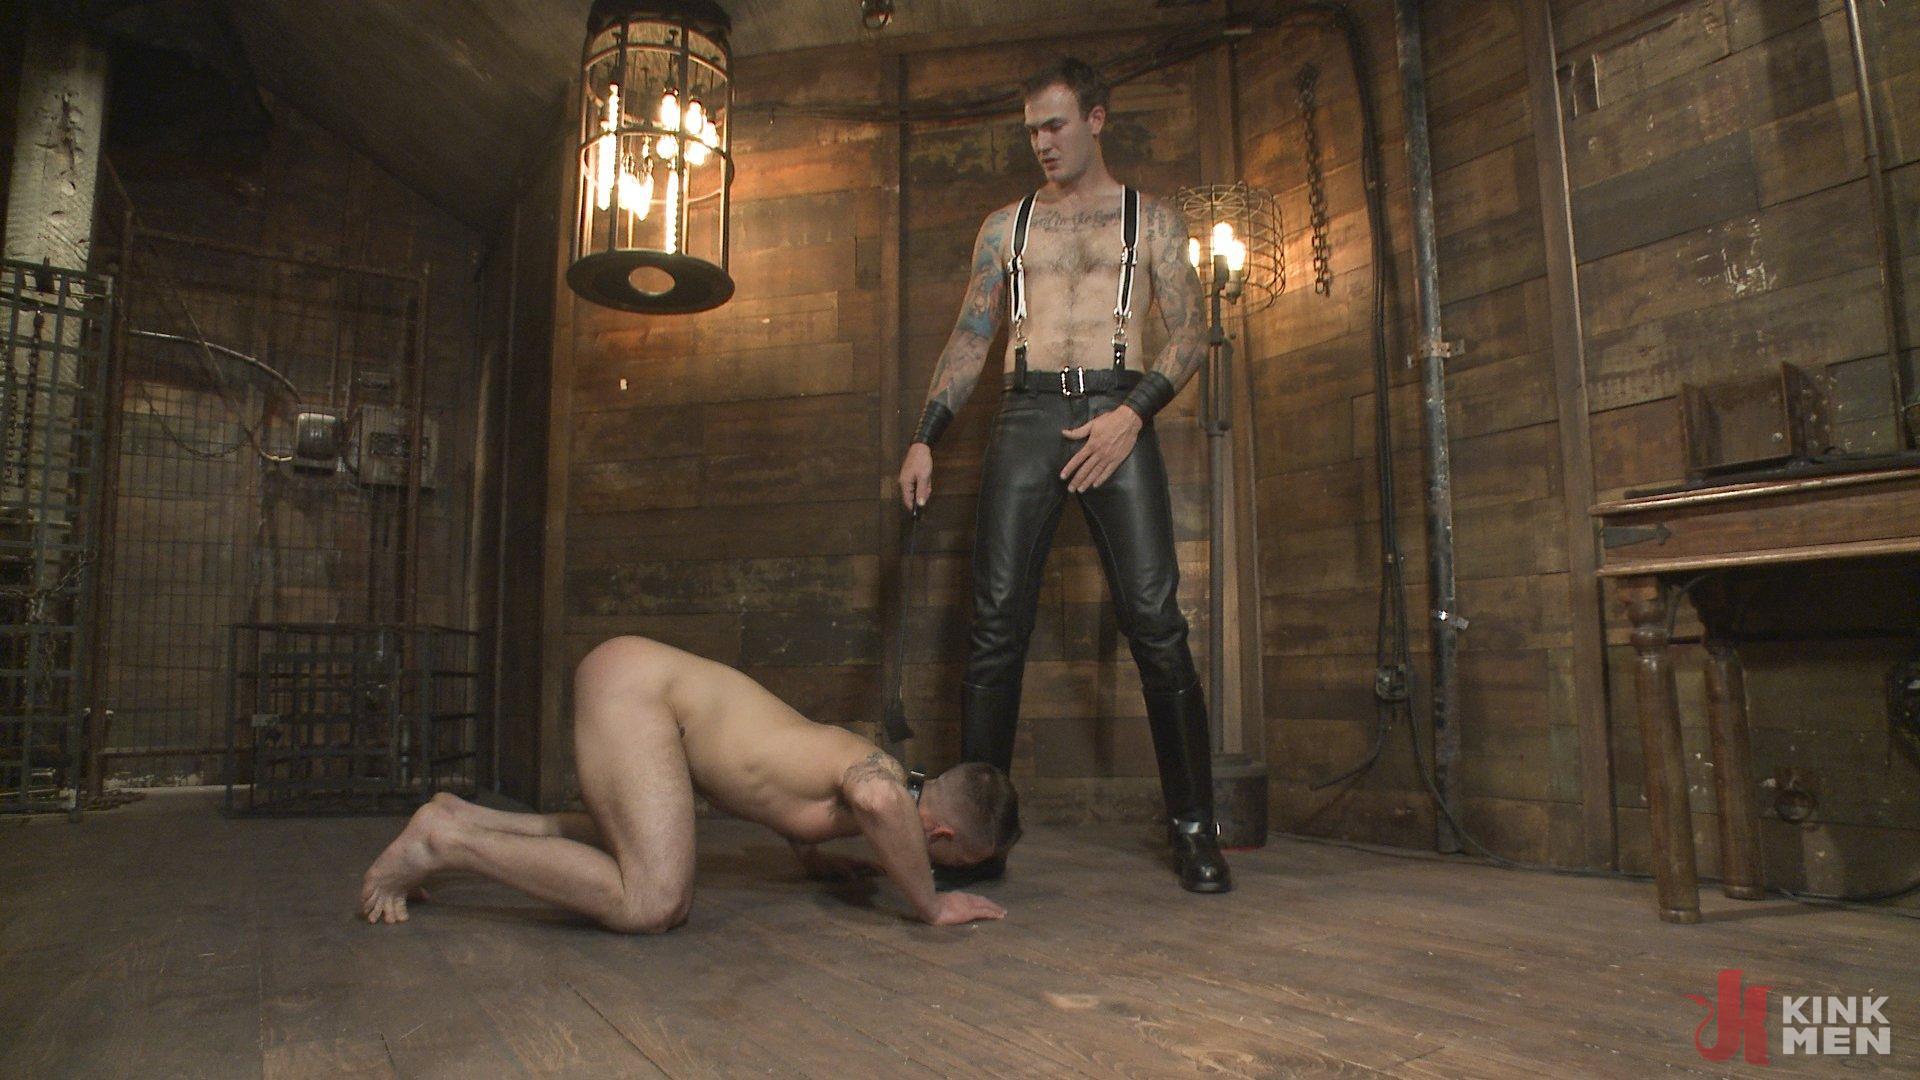 That's Master slave leather men